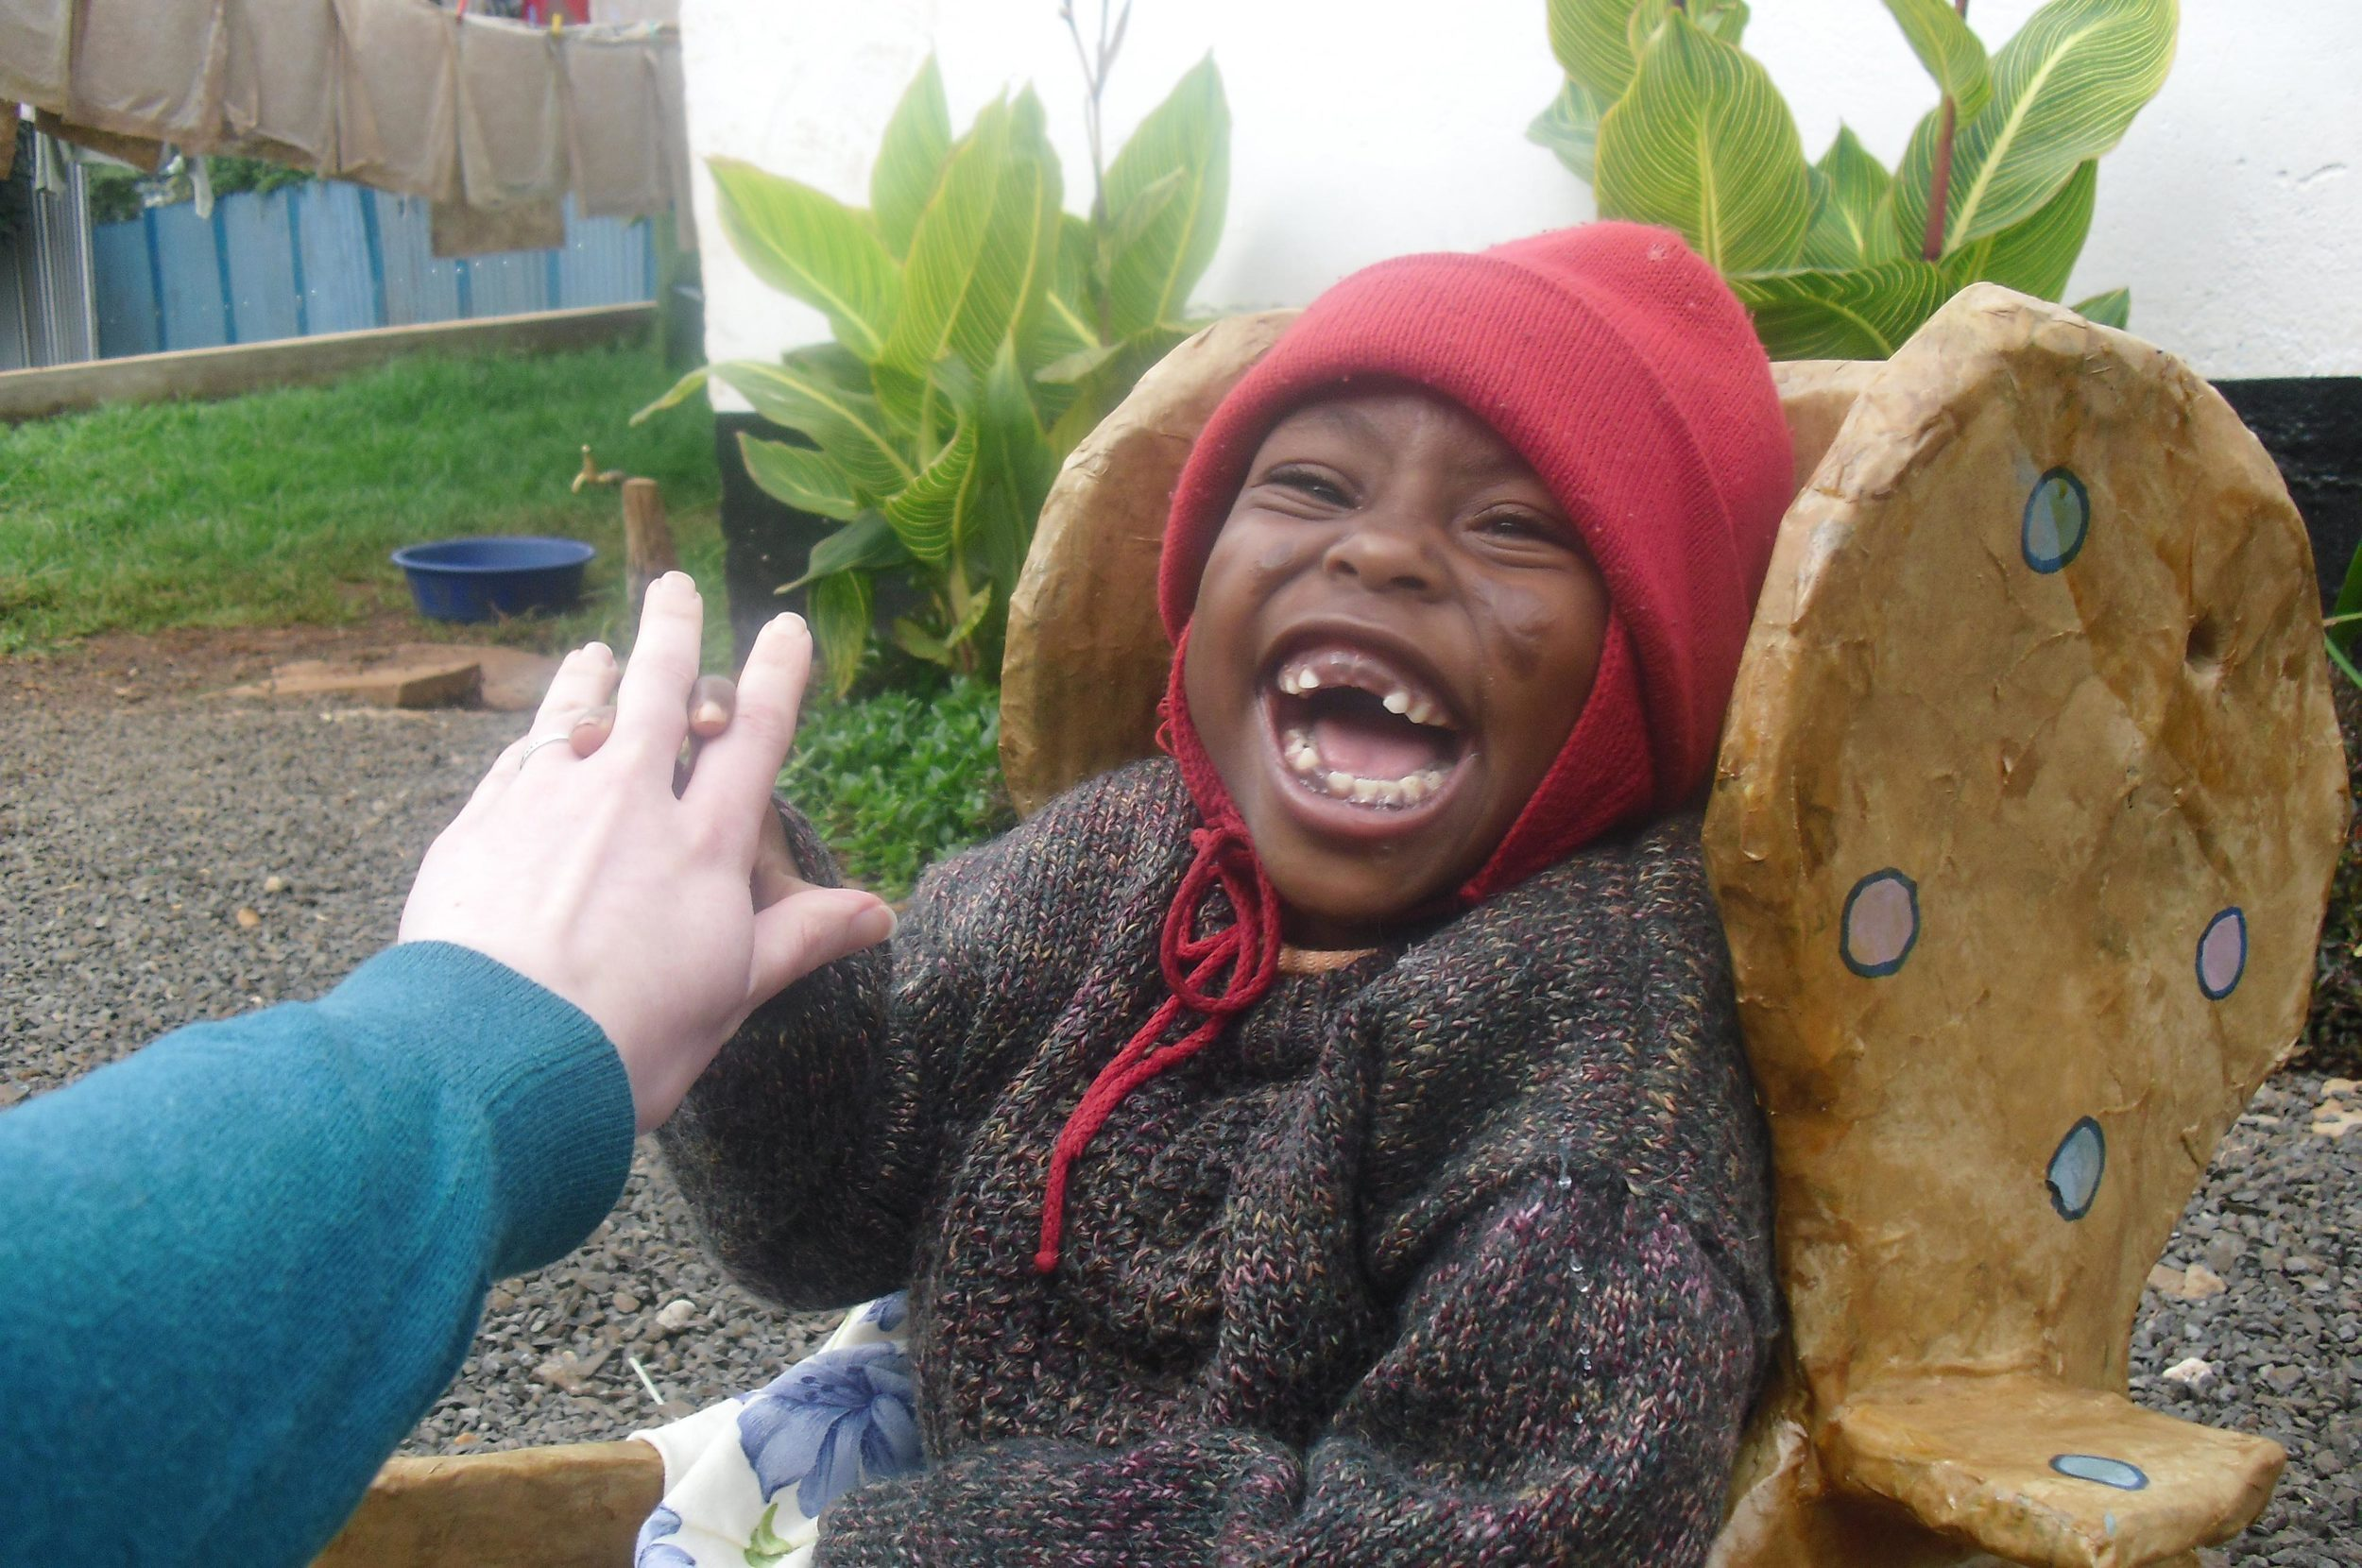 Child-Smiling_web.jpg